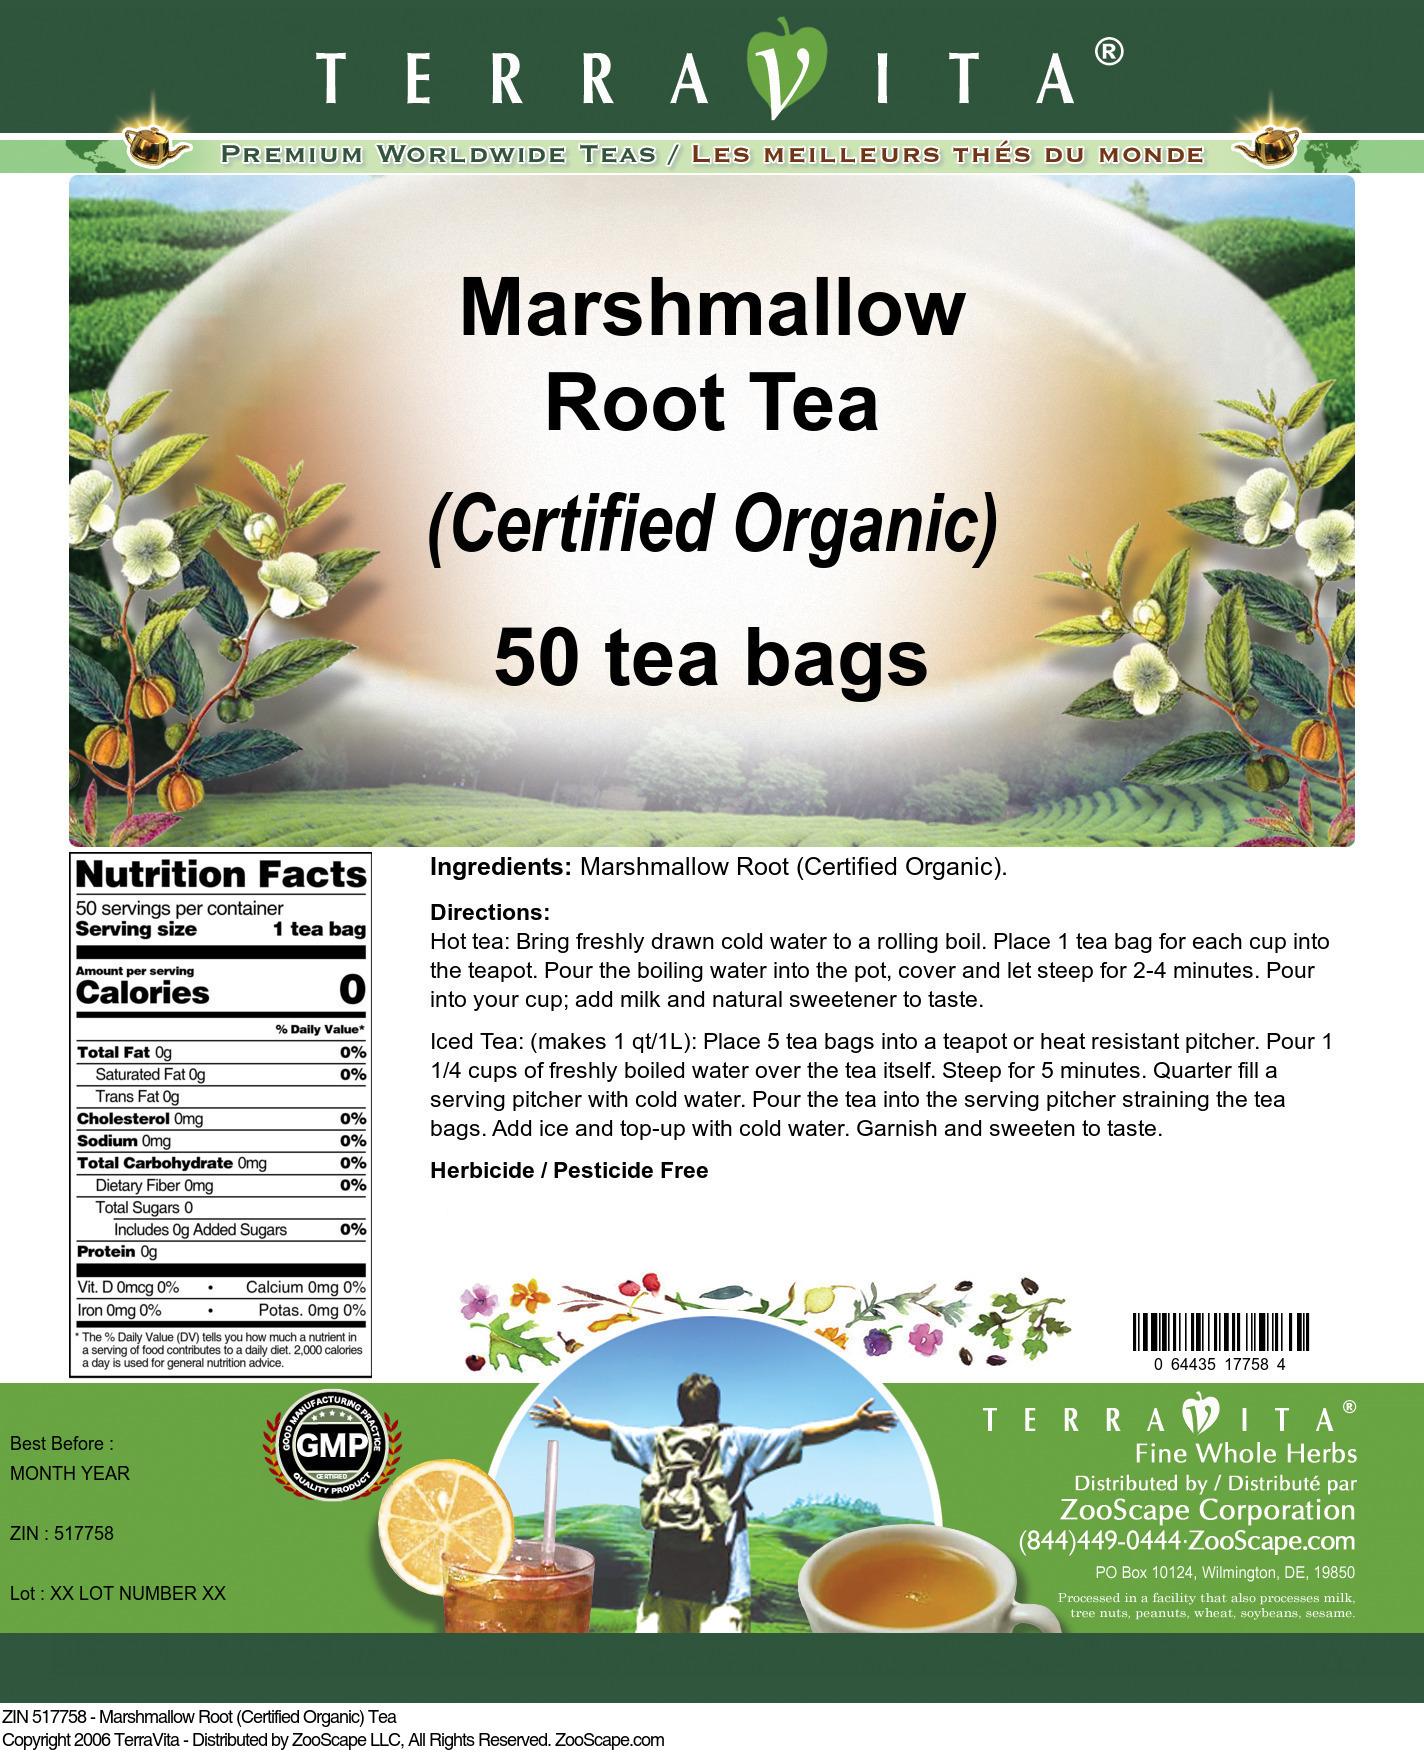 Marshmallow Root (Certified Organic) Tea